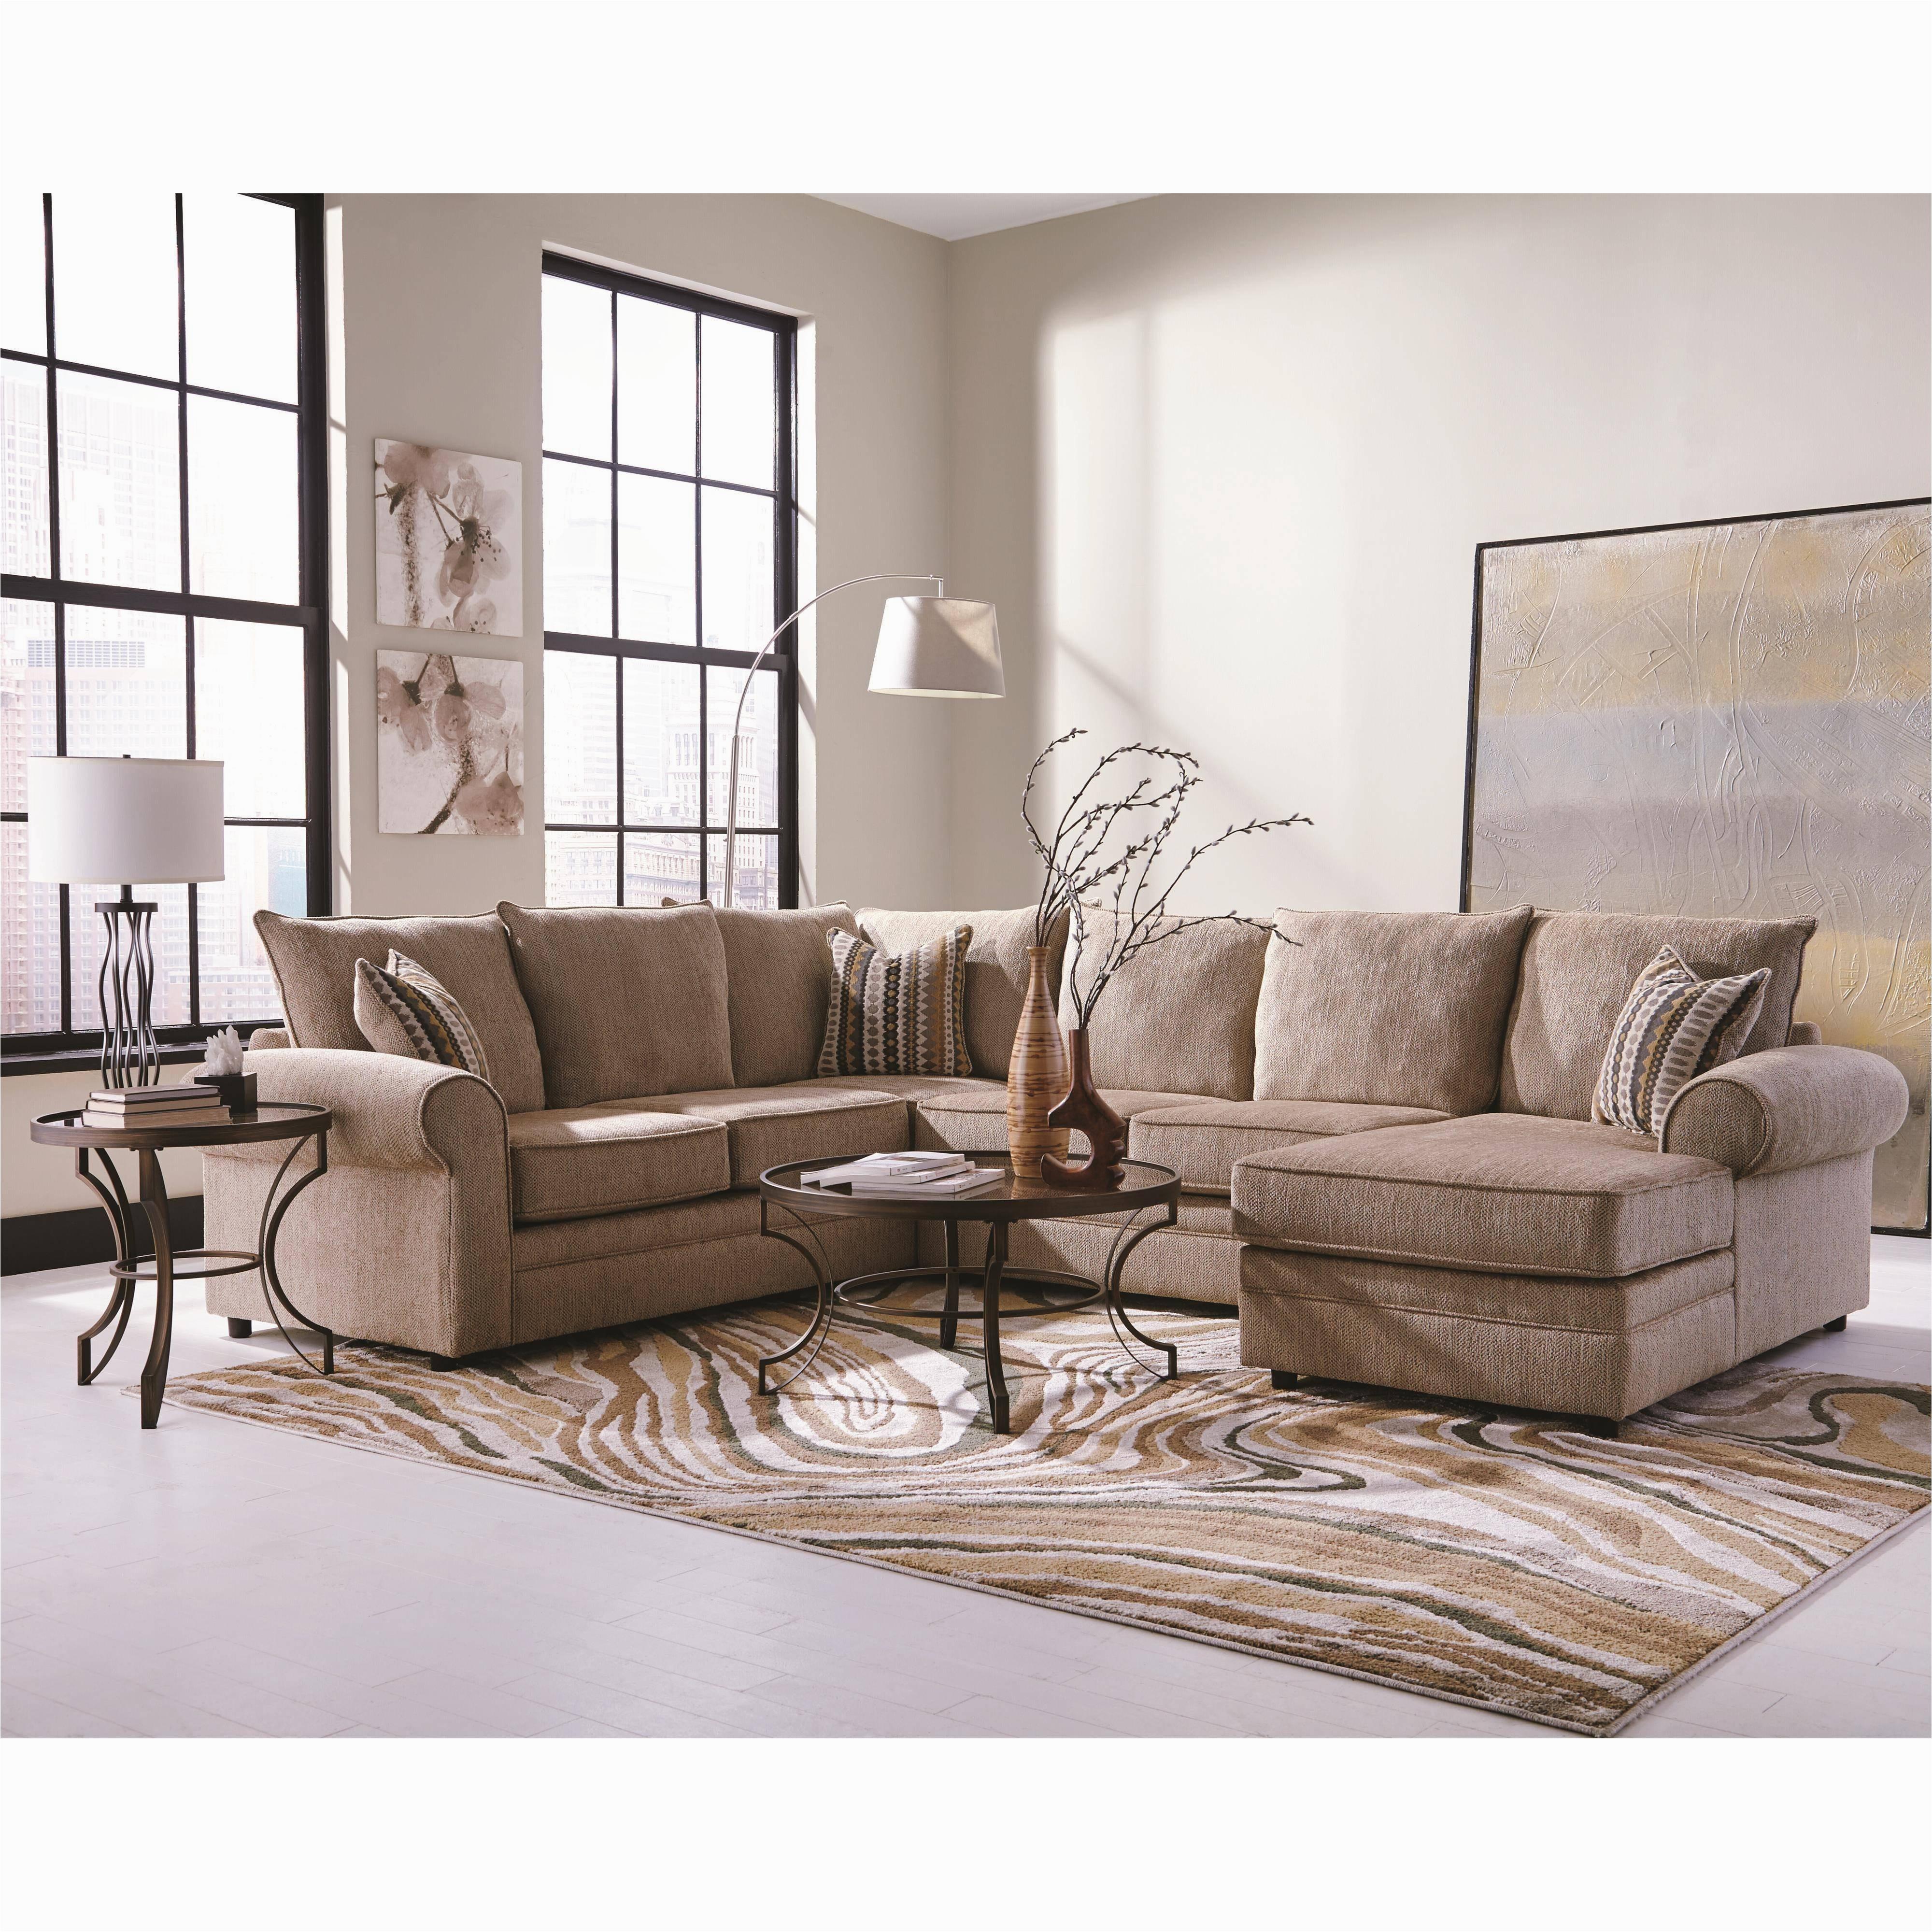 Whitash Furniture Columbia Sc Furniture Stores In Augusta Ga Bradshomefurnishings